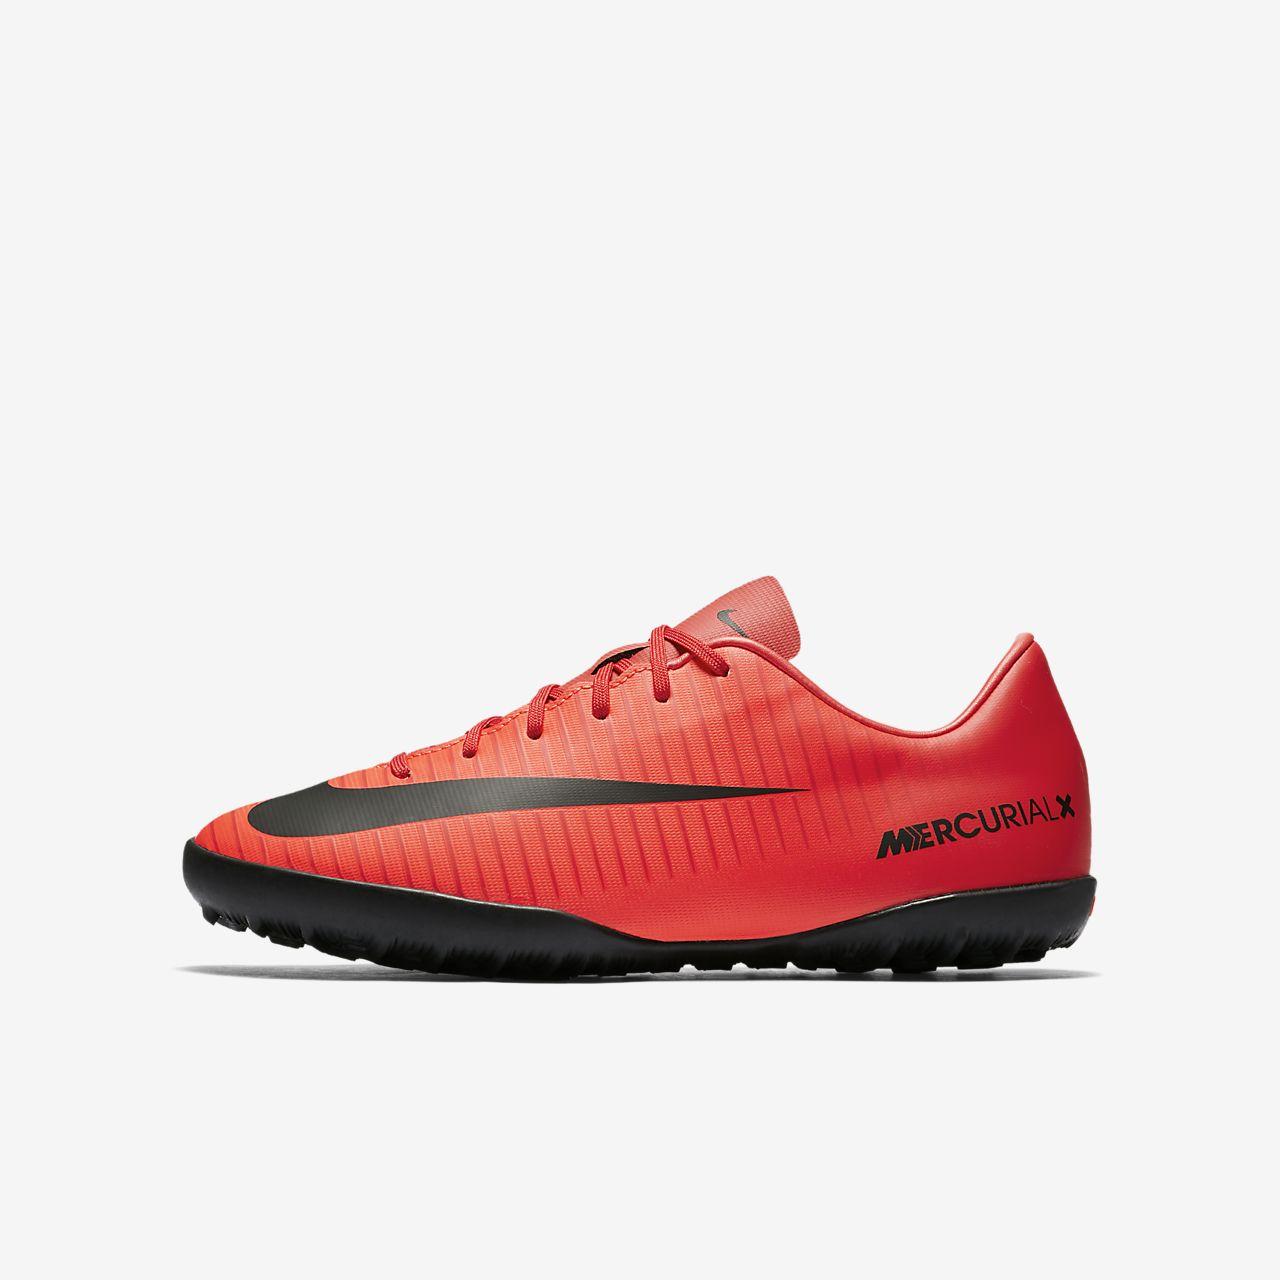 scarpe da calcio nike per campi sintetici